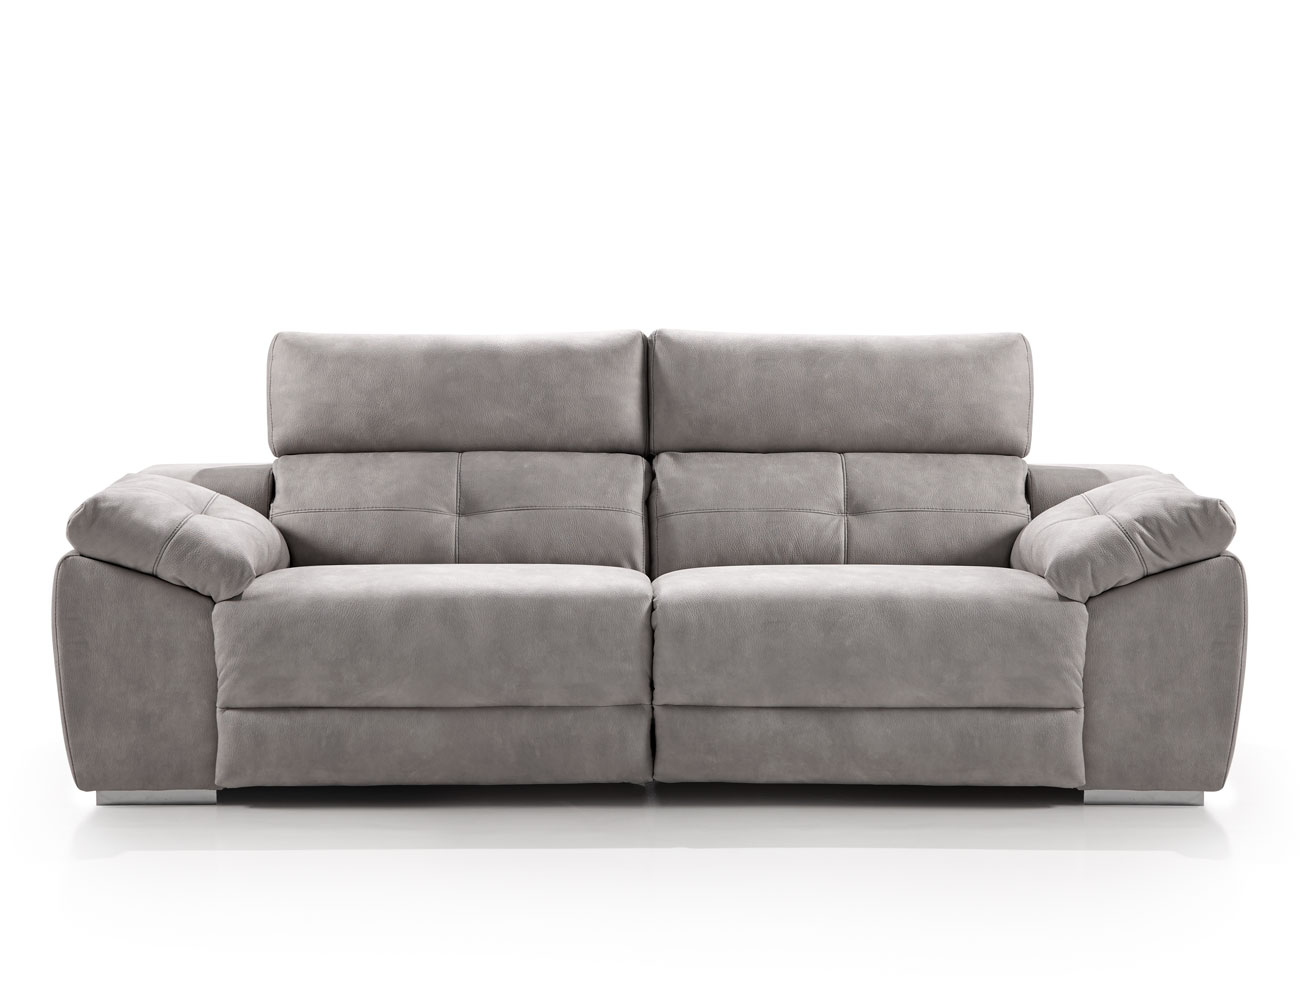 Sofa 3 plazas acomodel relax motor